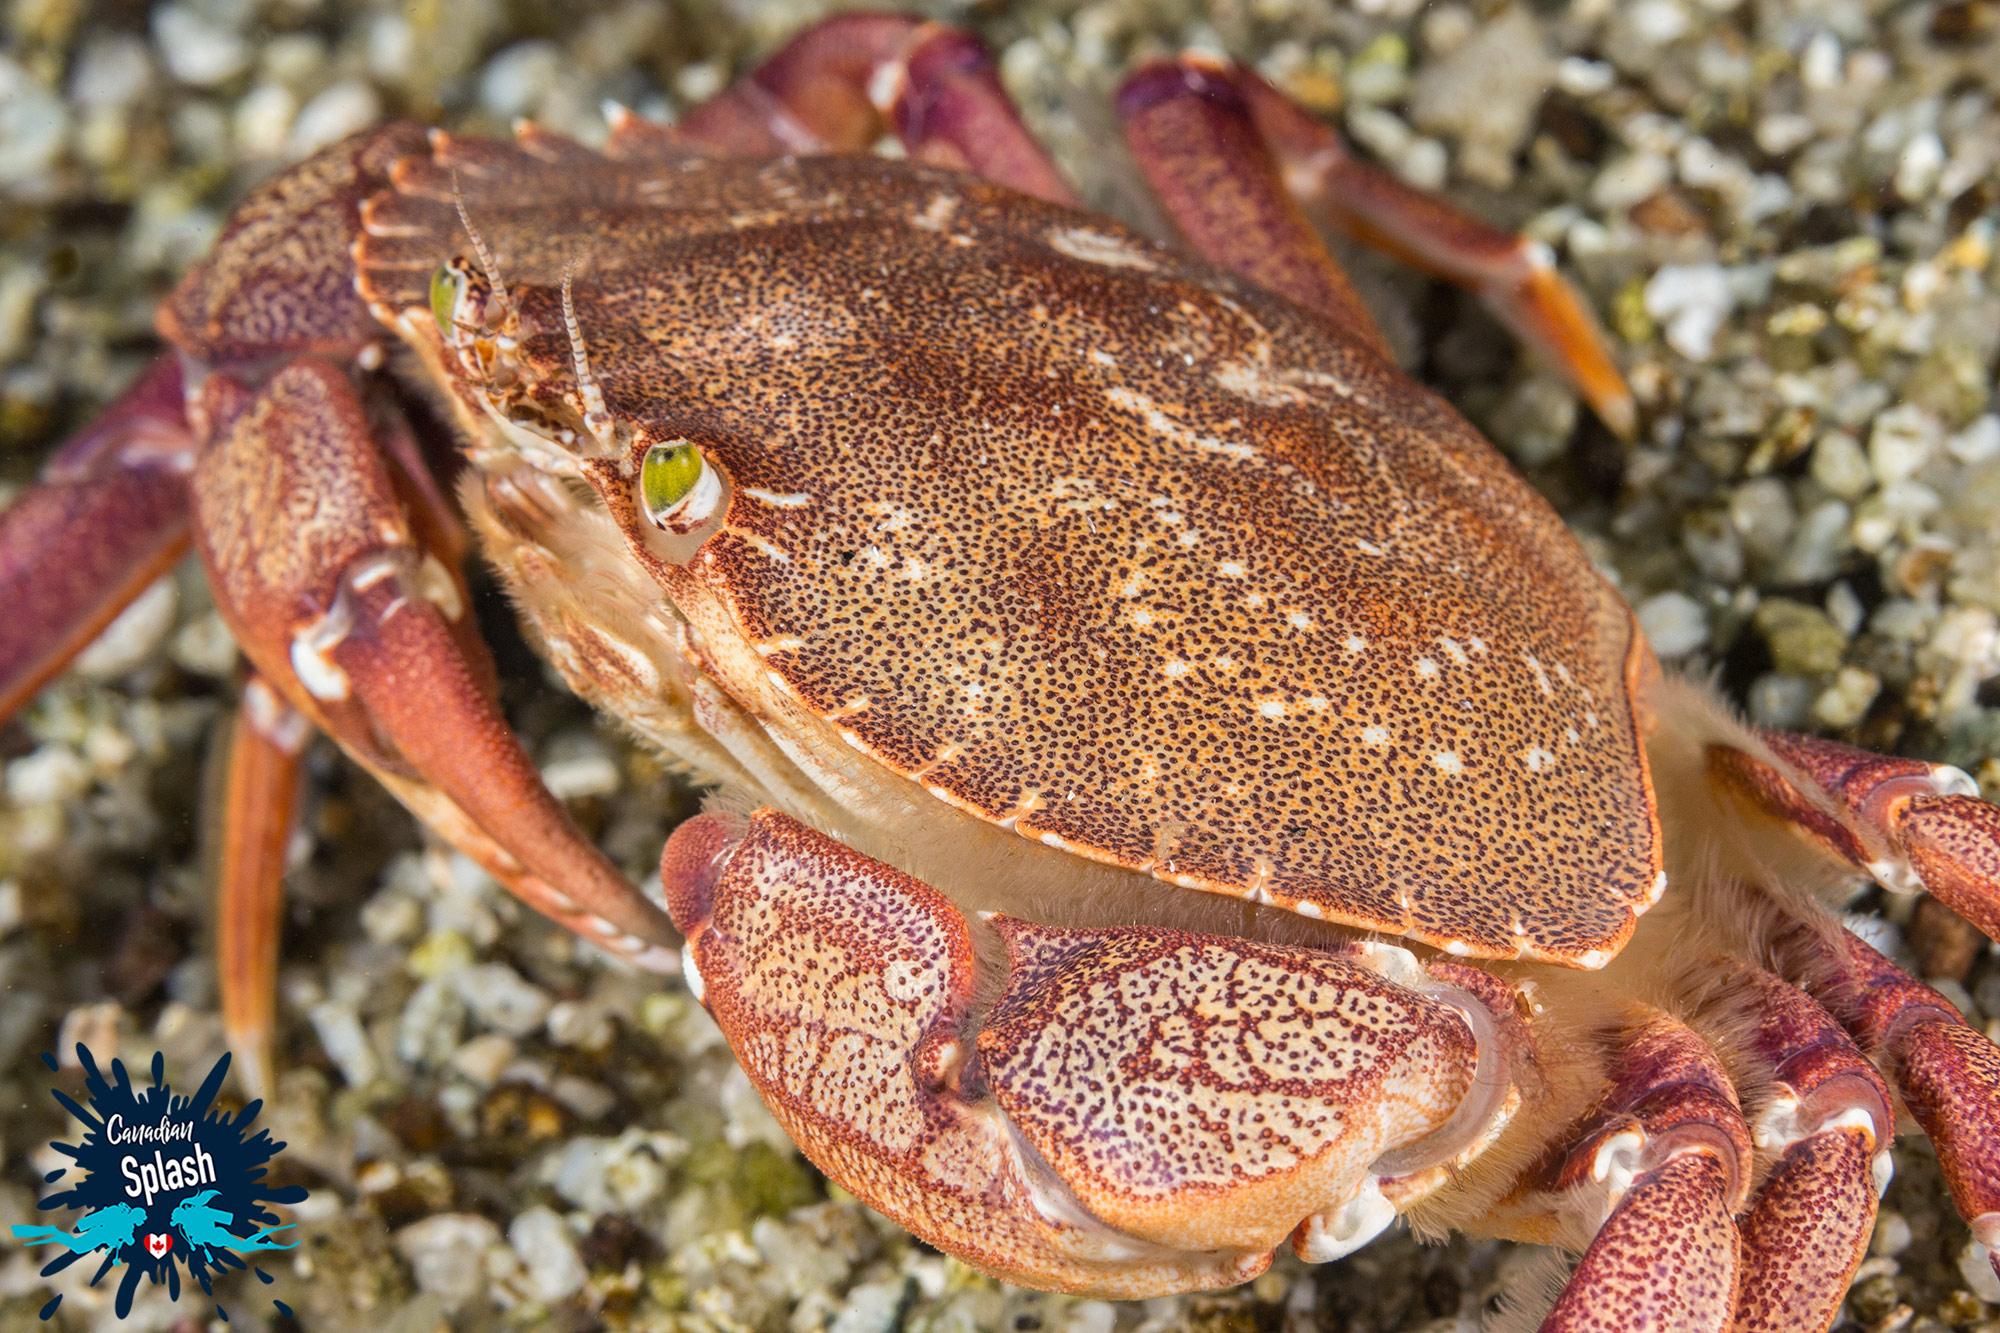 An Atlantic Rock Crab On The Bottom Of The Ocean In Halifax, Nova Scotia Diving, Canada